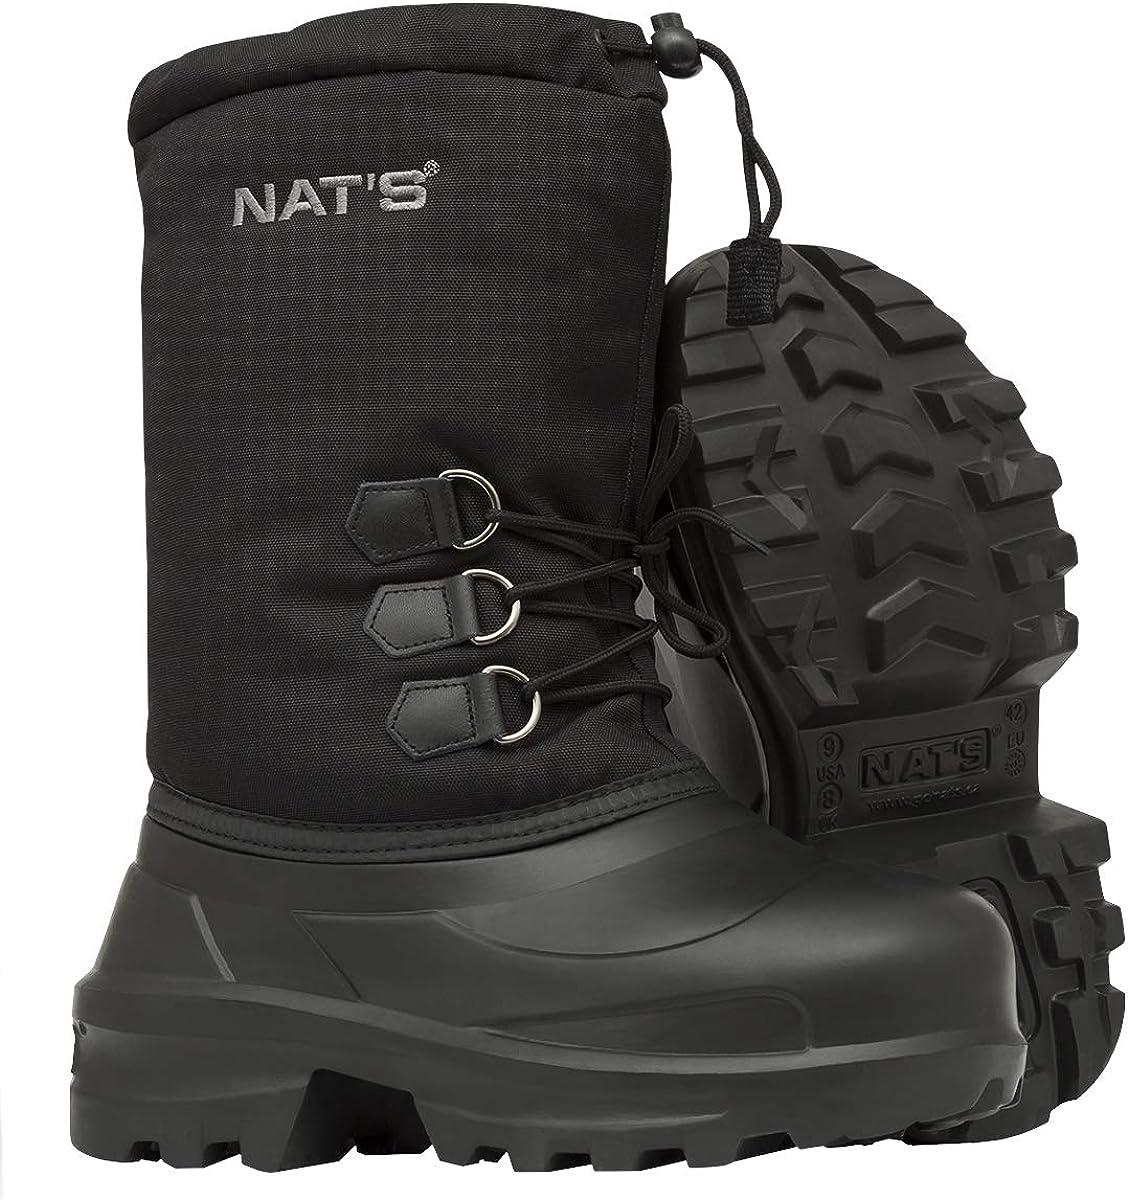 Award-winning store R900 Waterproof Winter Boots Mesa Mall Up to Snowmo -121°F - as Perfect